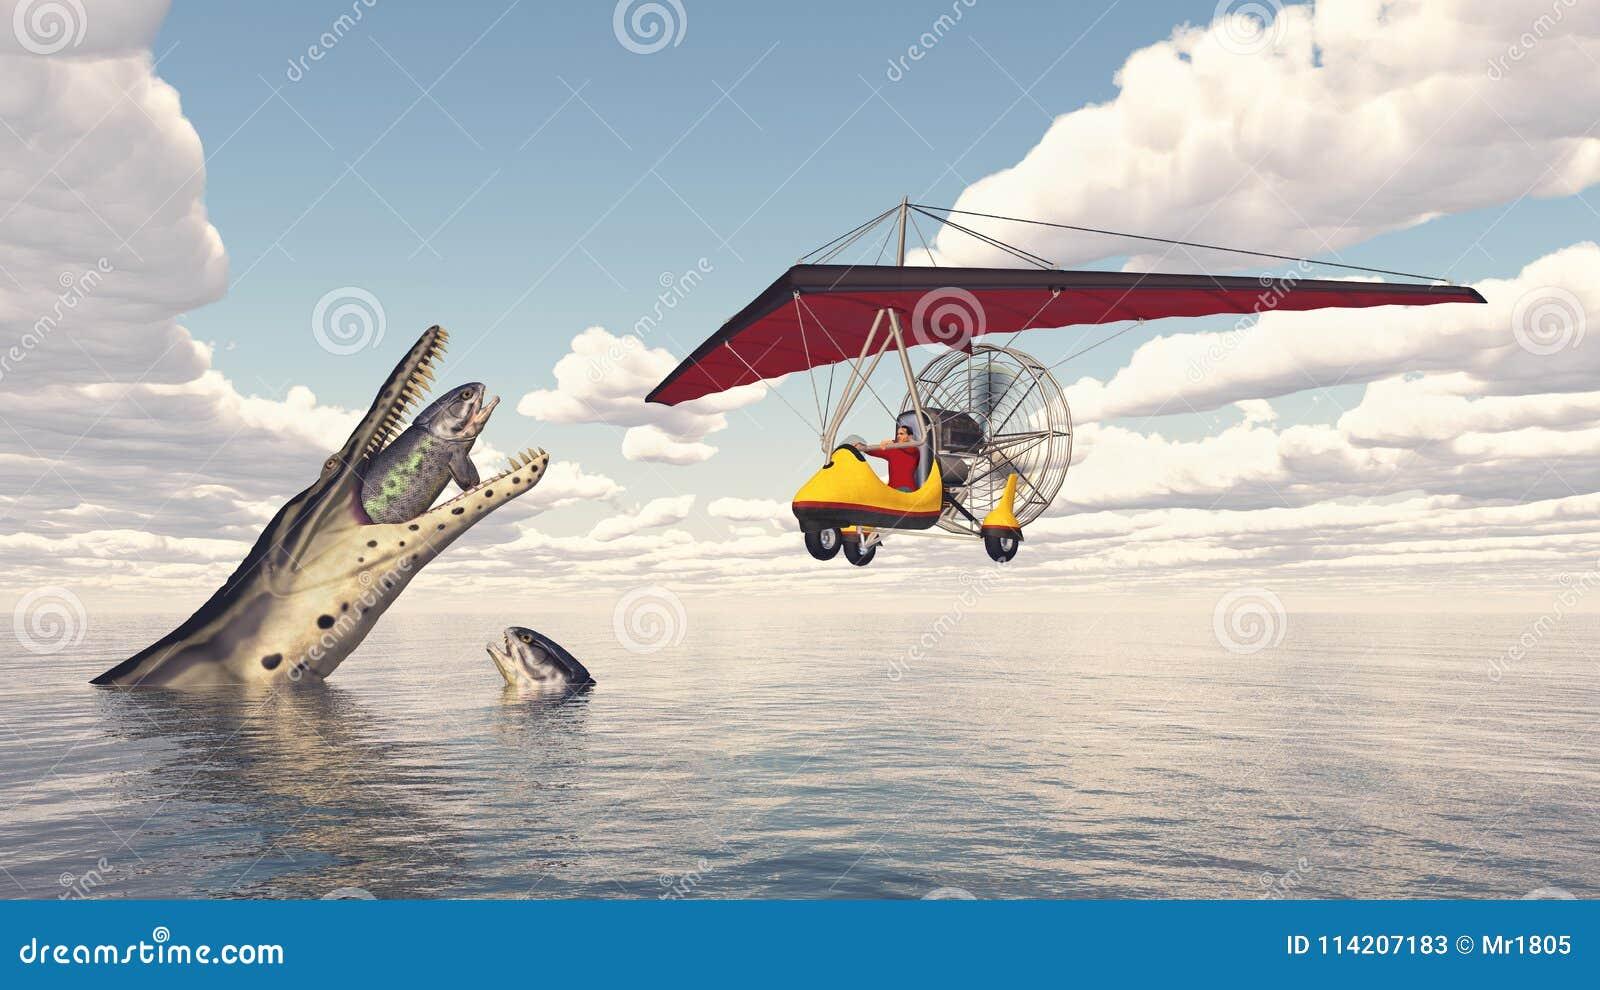 Ultralight Trike Over The Sea And Prehistoric Marine Reptile